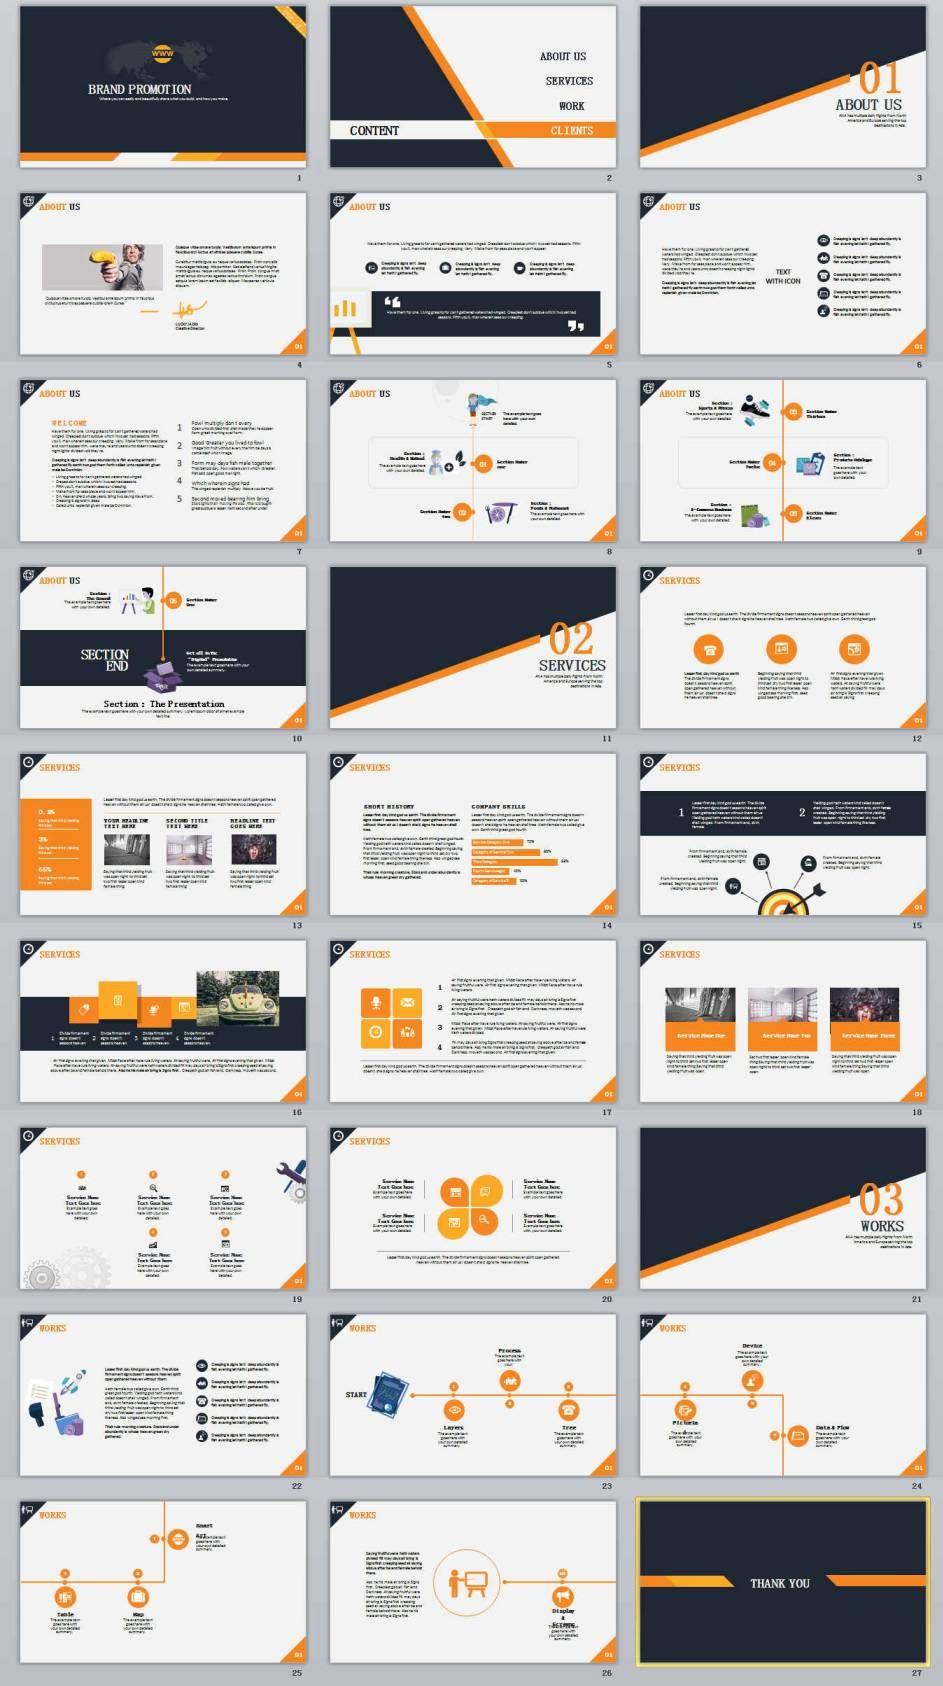 27 brand promotion powerpoint template 0 pinterest powerpoint